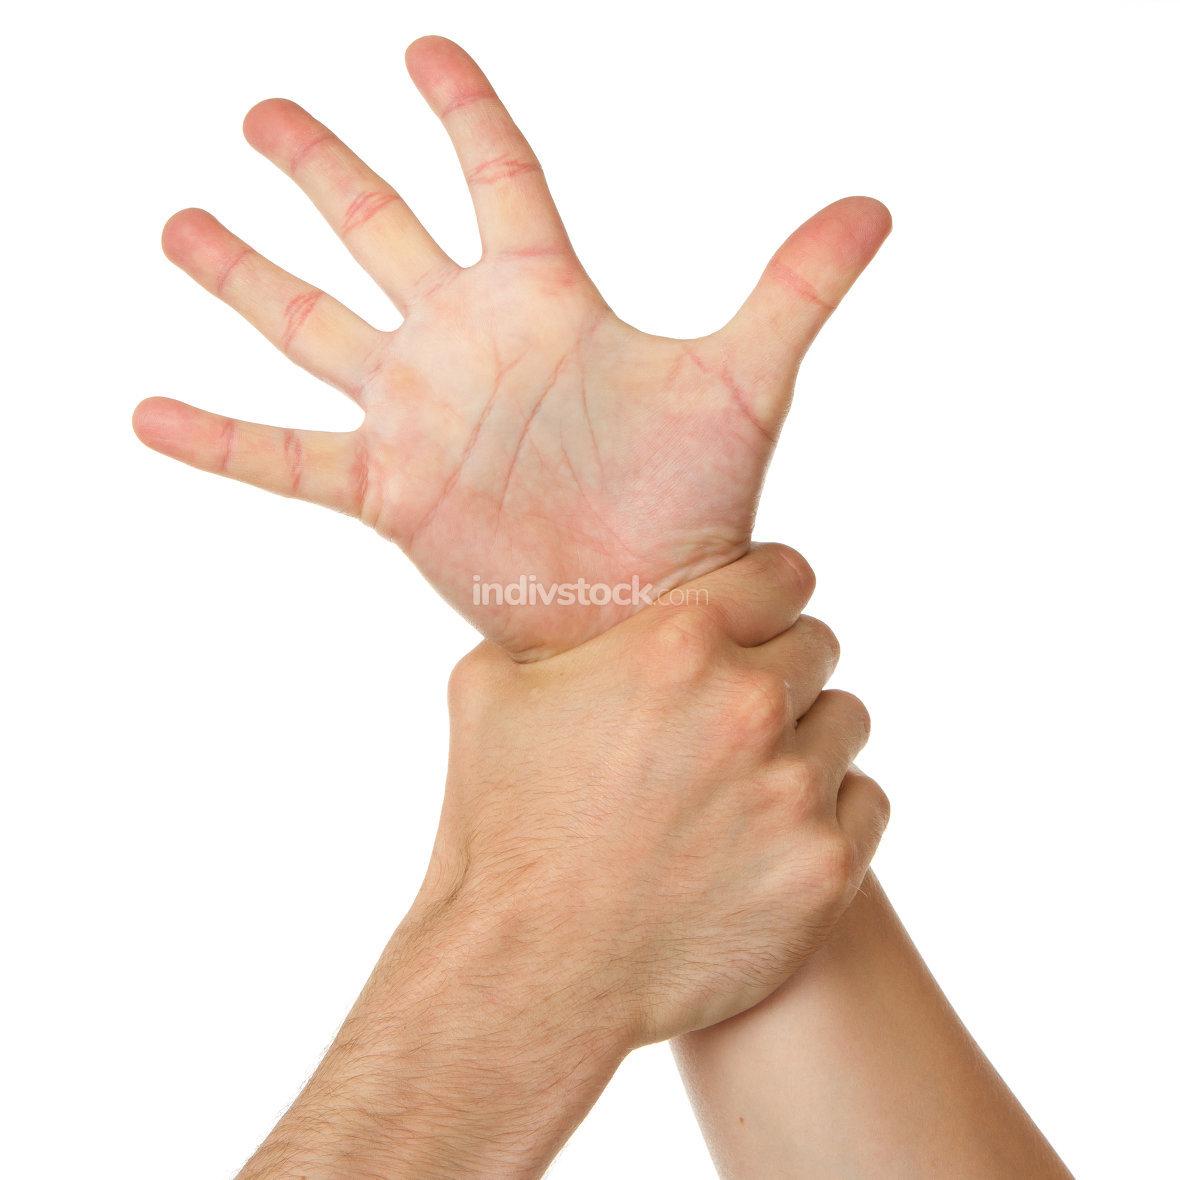 Man holding woman by wrist